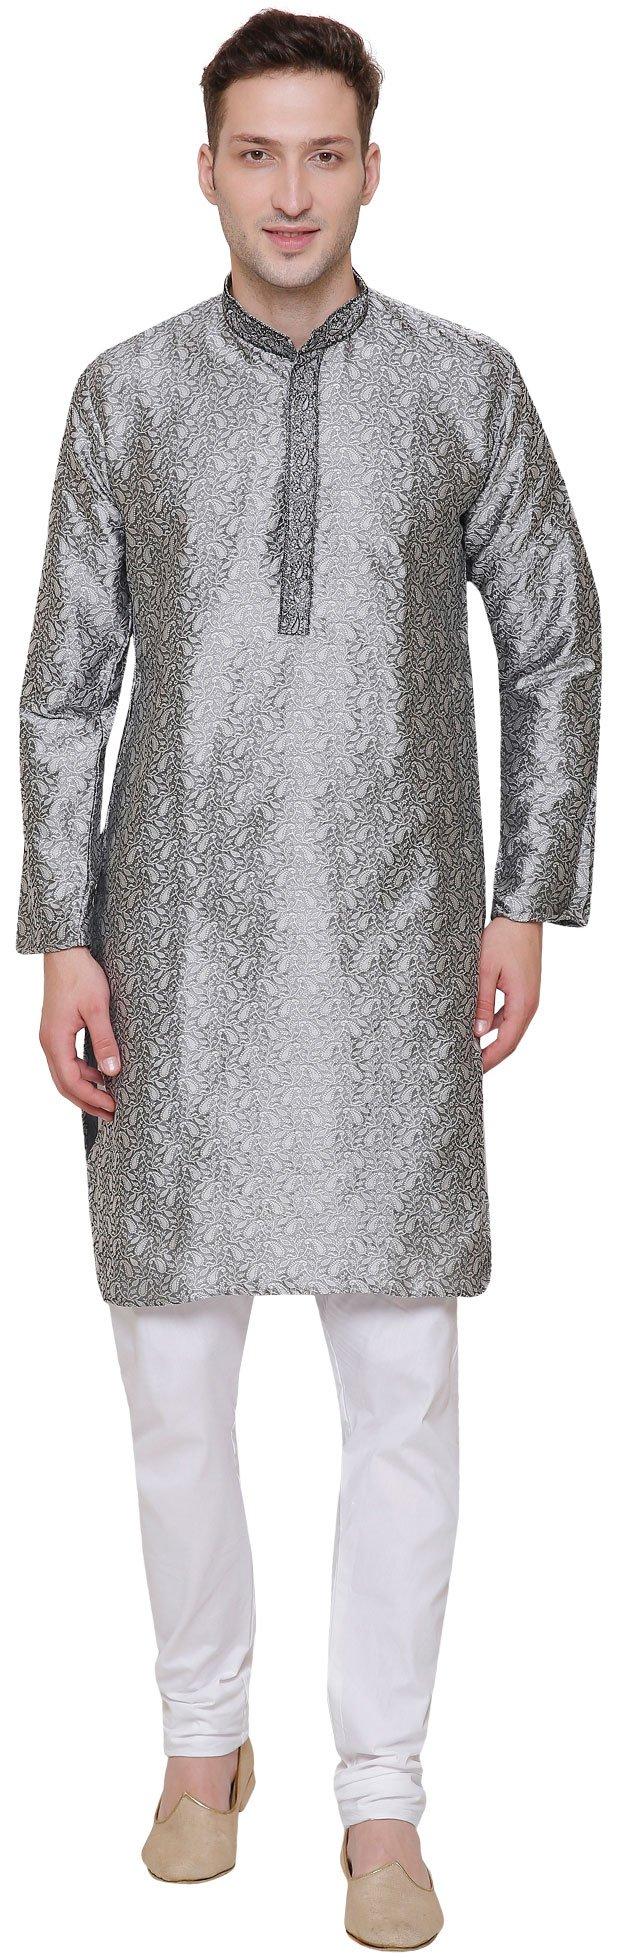 Jacquard Silk Embroidered Mens Kurta Pajama India Clothing (Grey, XL)